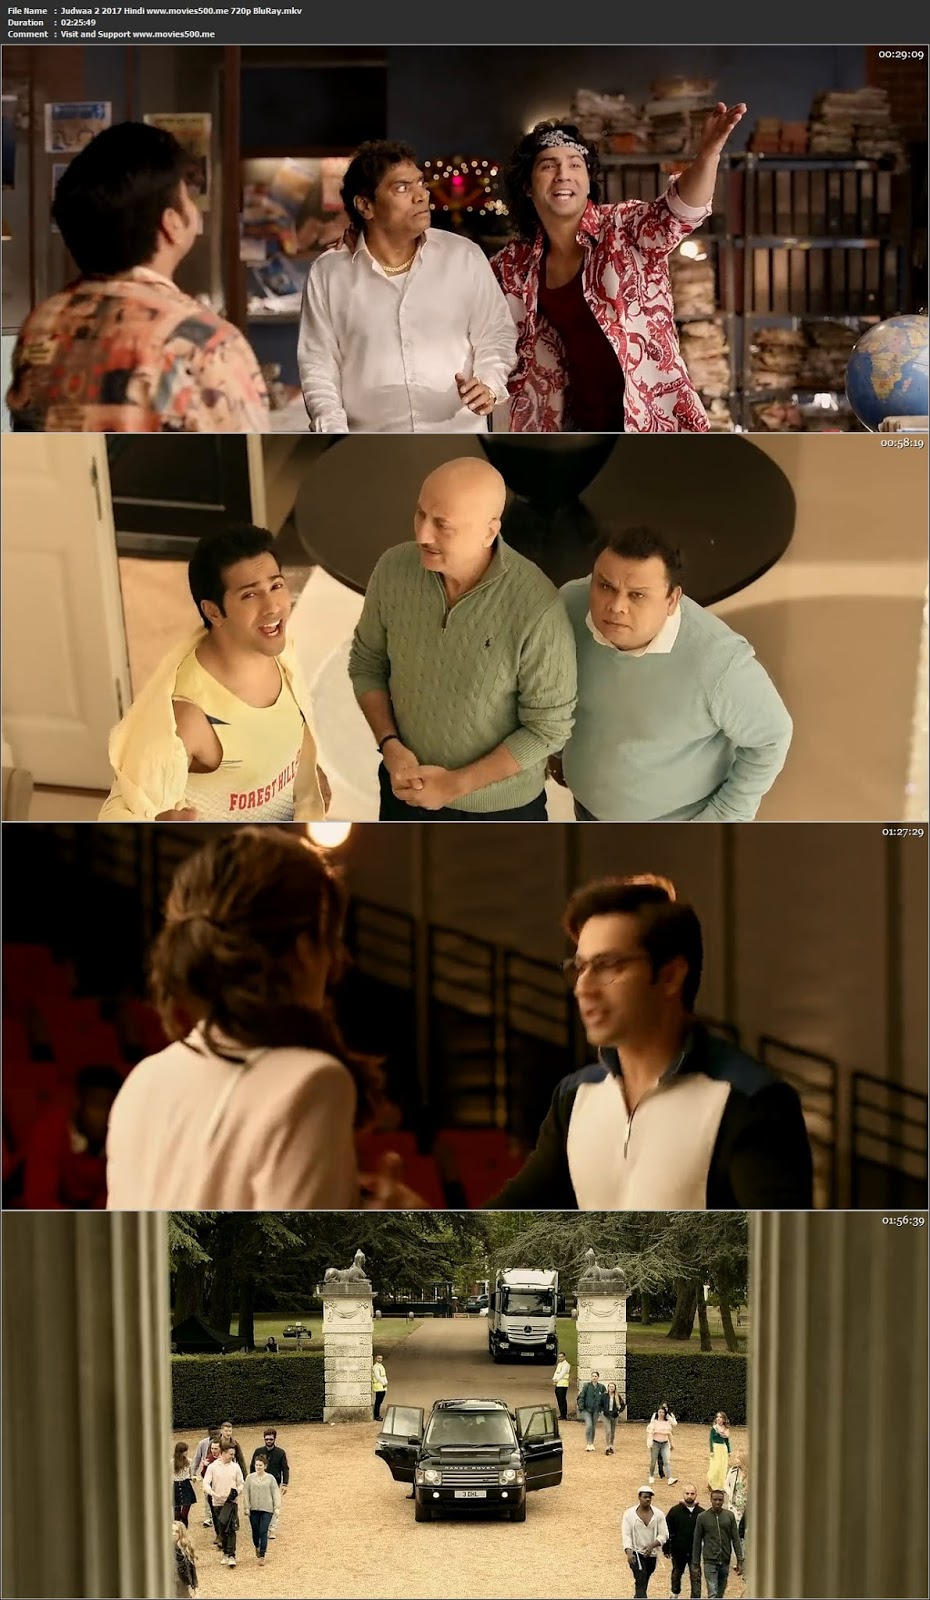 Judwaa 2 2017 Hindi Full Movie BluRay 720p 1GB at gileadhomecare.com